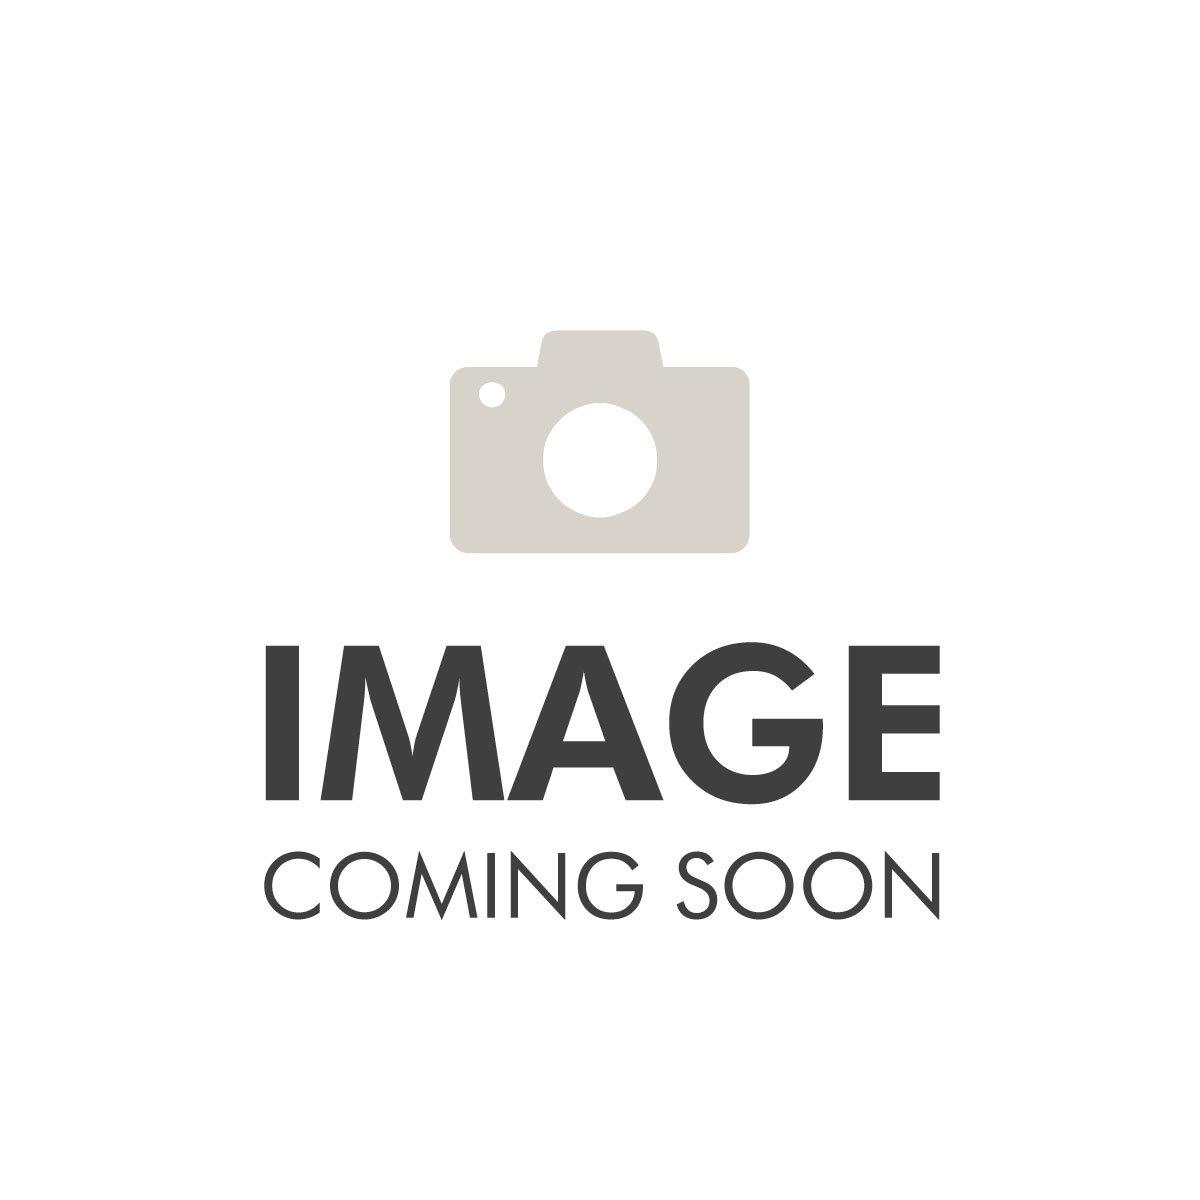 Adidas Fragrances Adidas Team Force 100ml EDT Spray